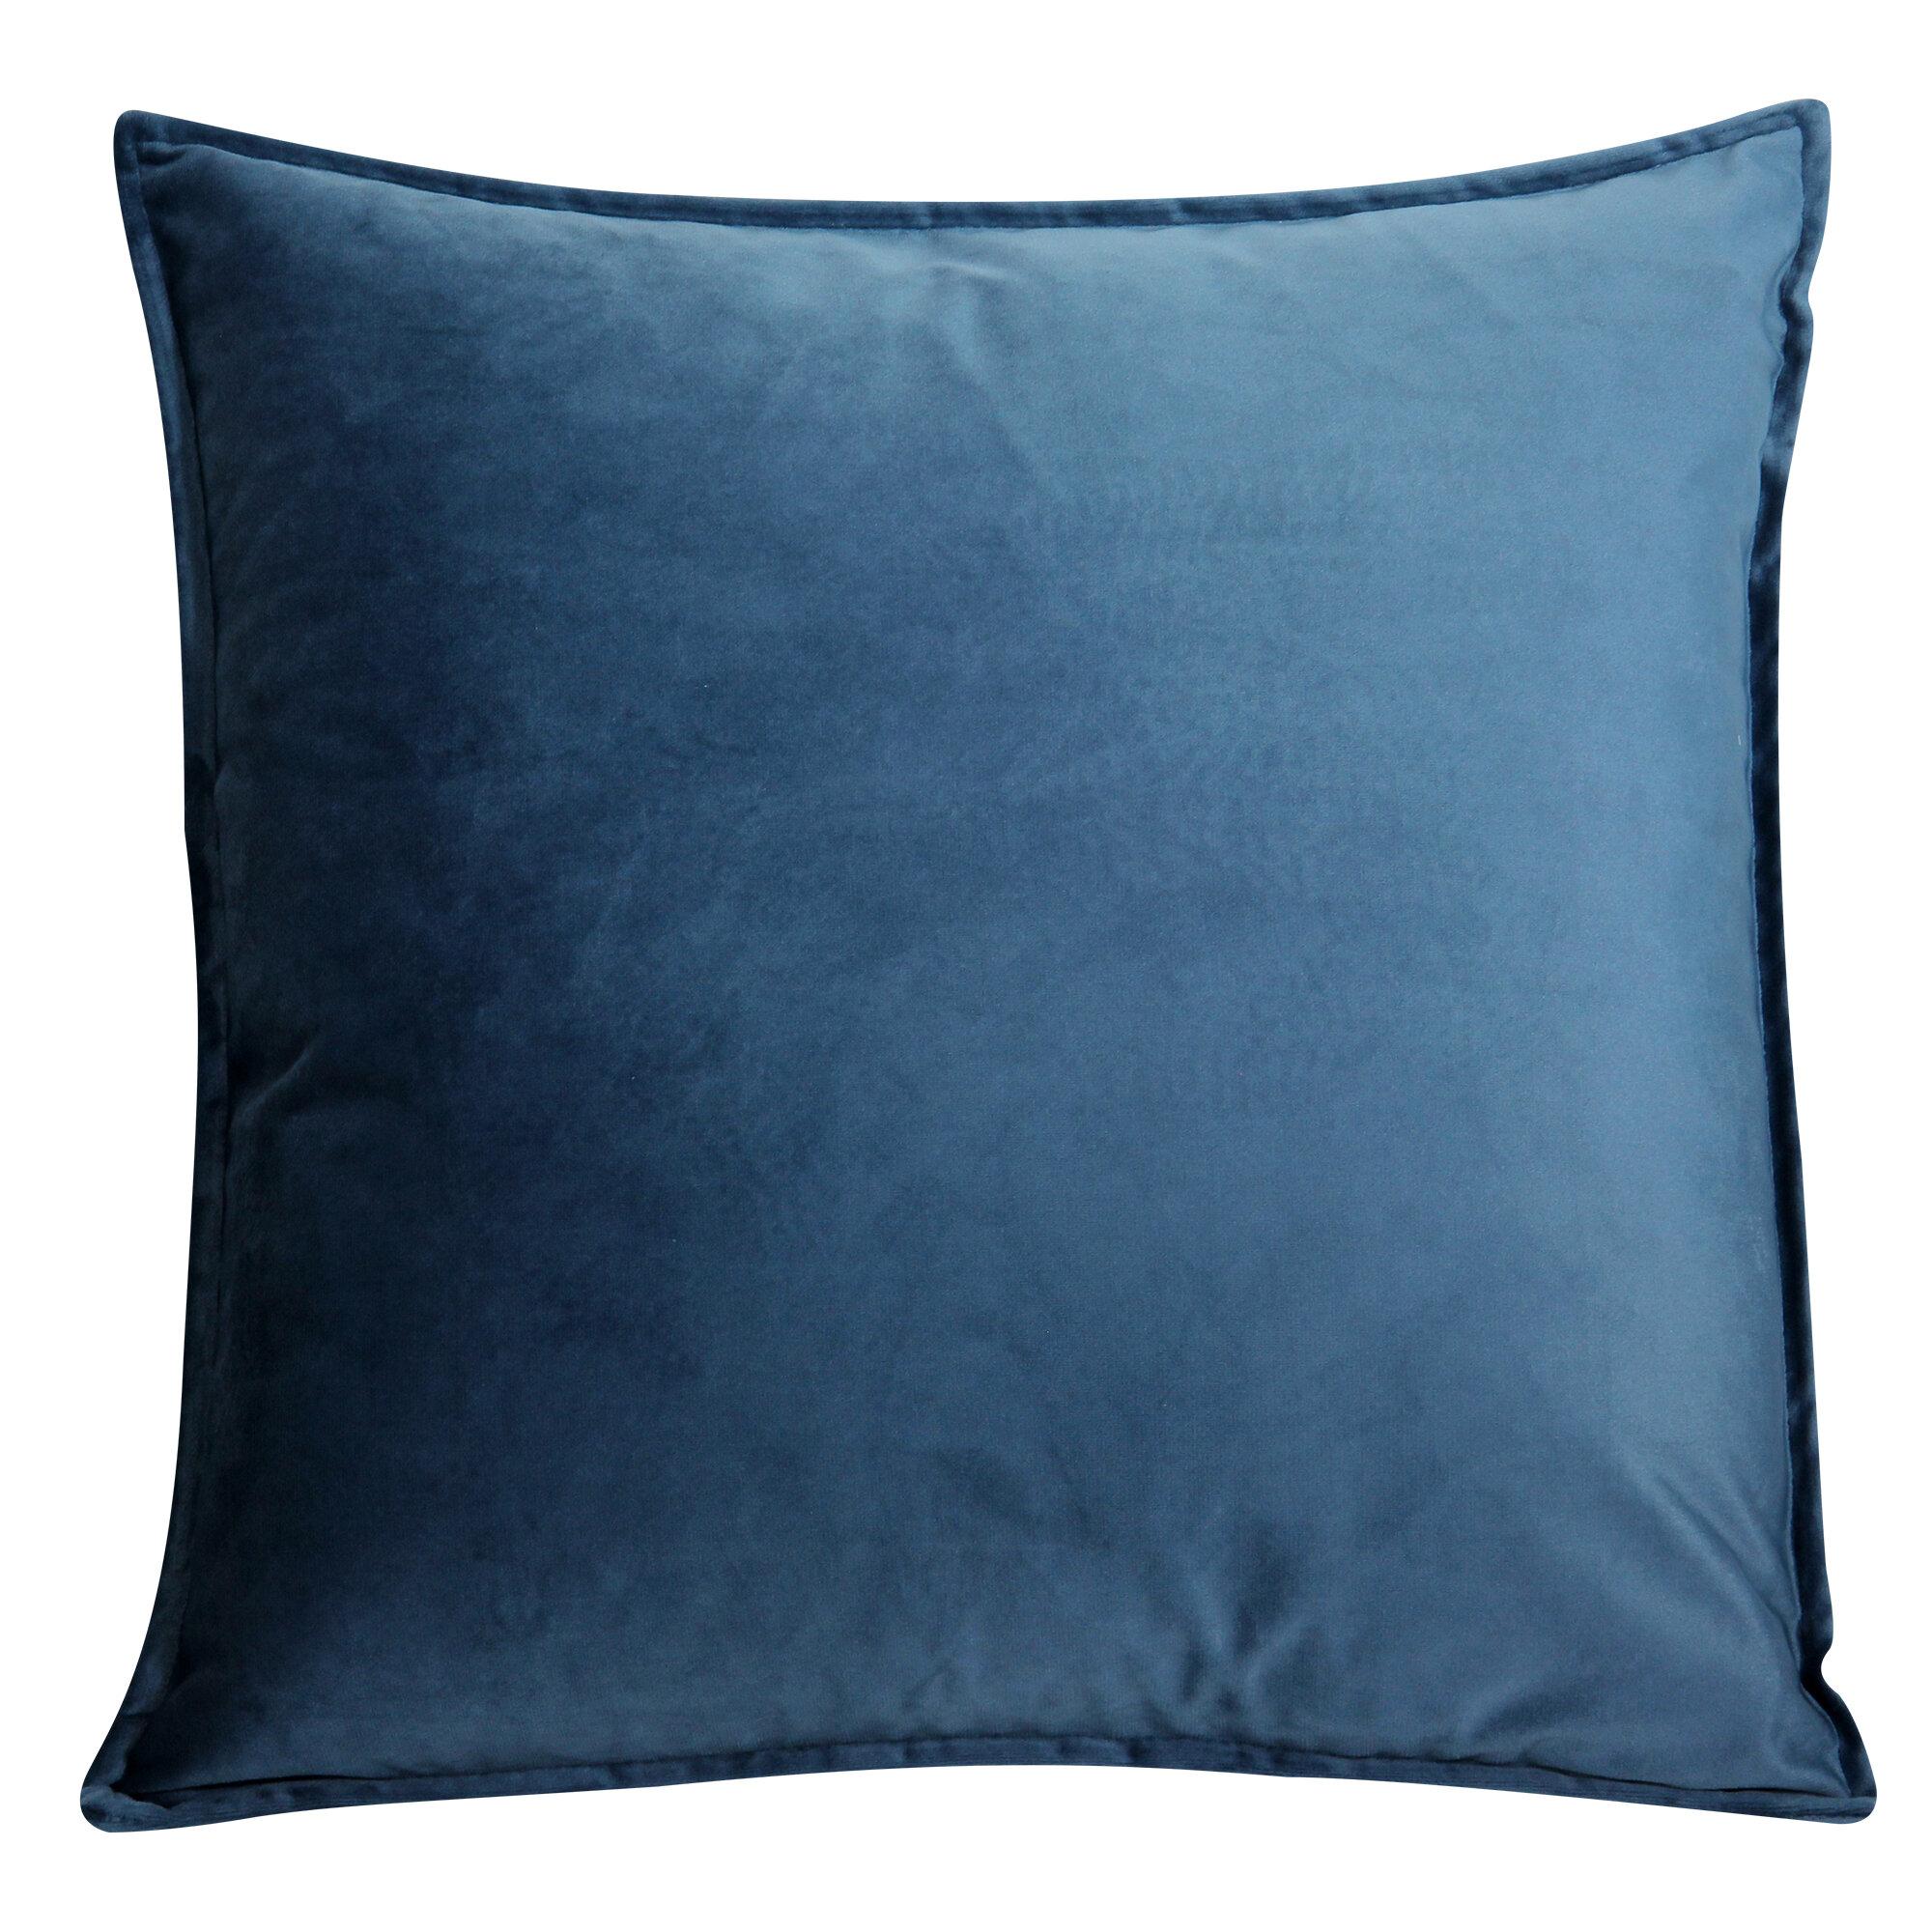 Ebern Designs Moorebank Velvet Throw Pillow Cover Reviews Wayfair